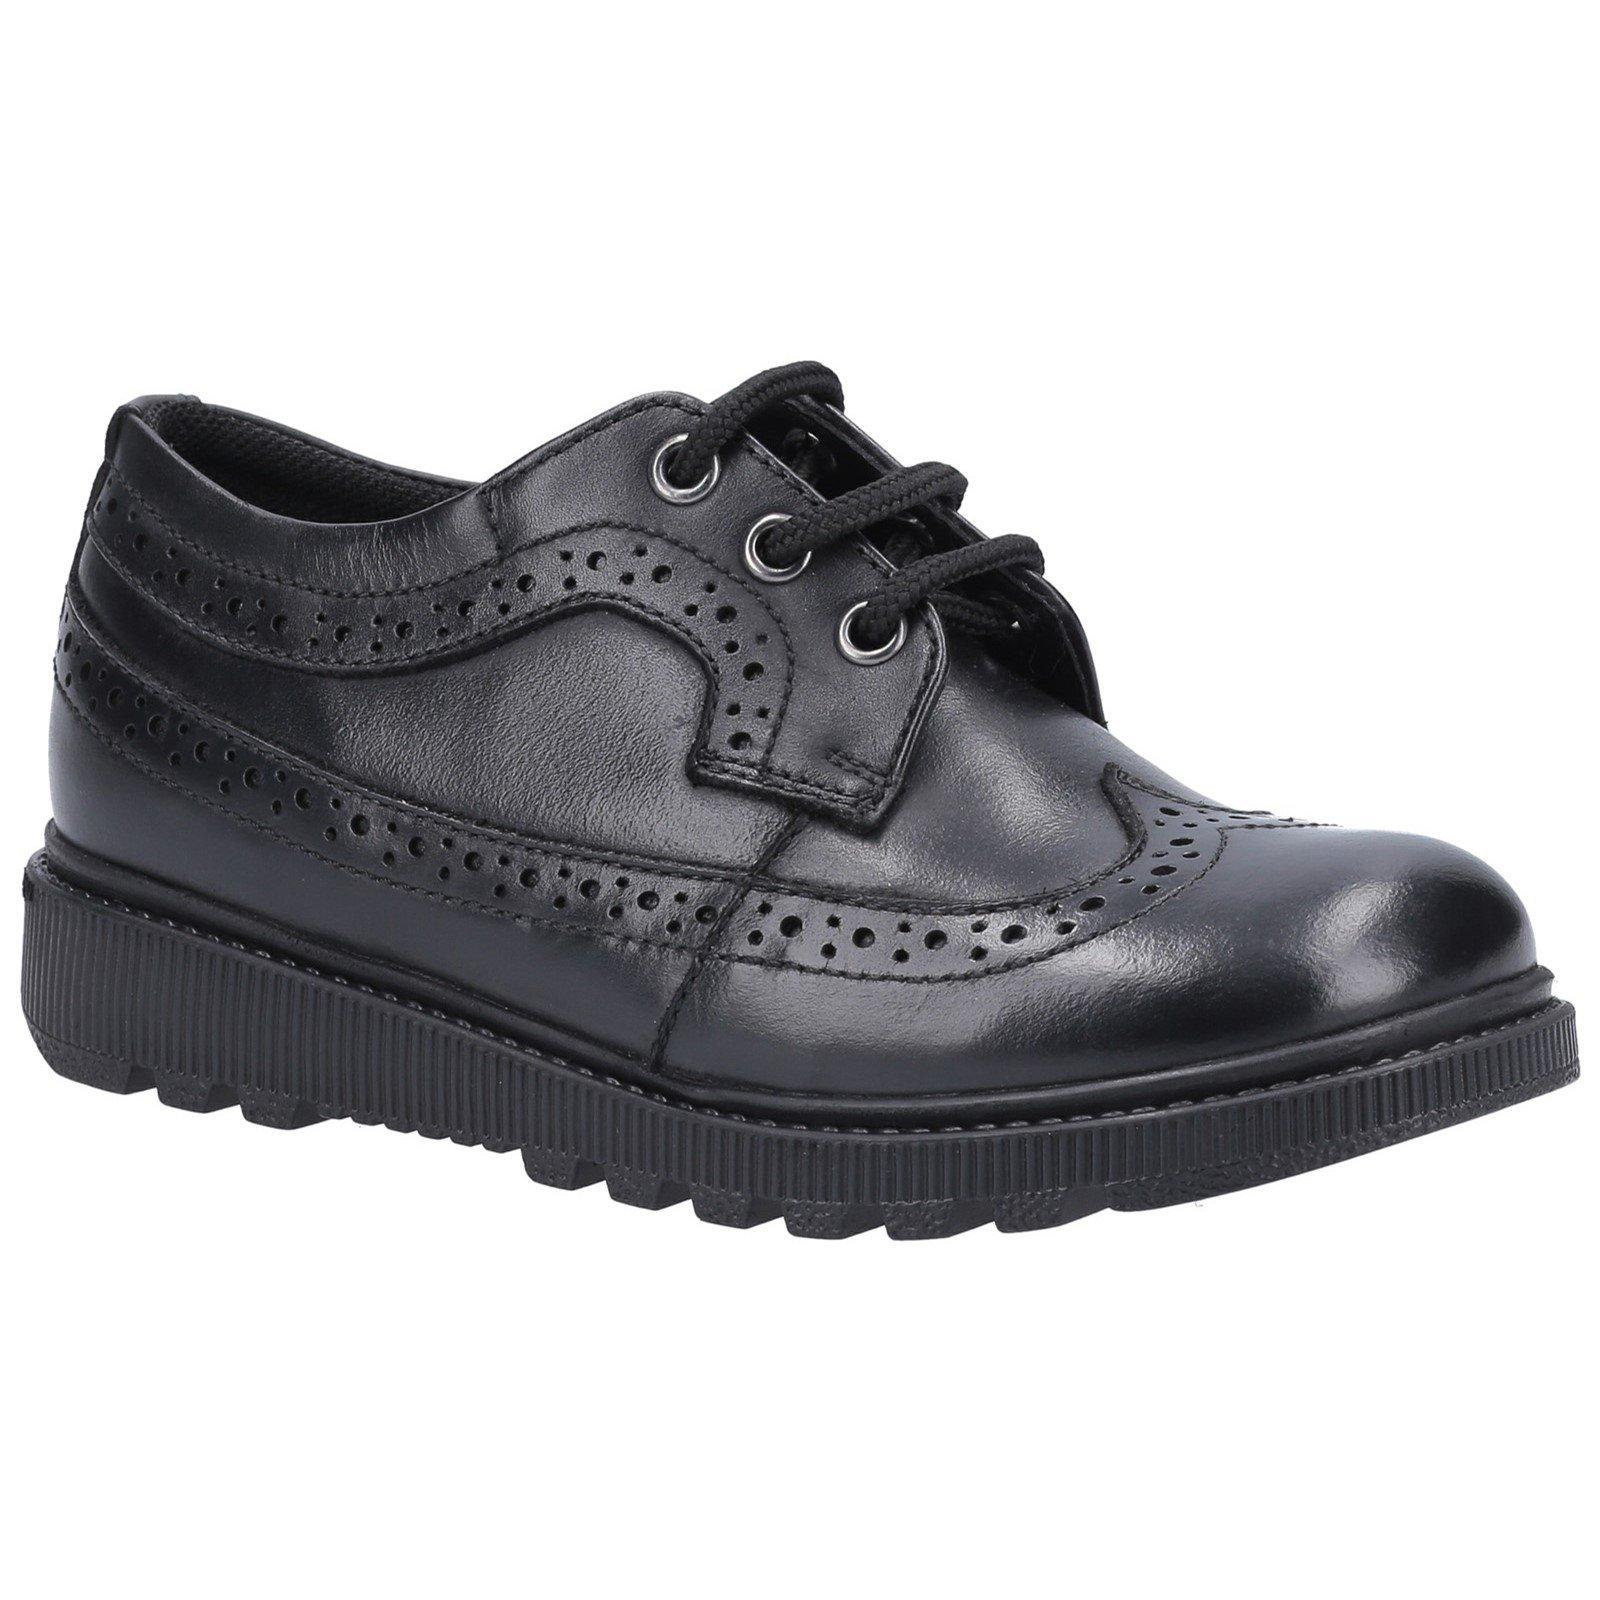 Hush Puppies Kid's Felicity Junior School Oxford Shoe Black 30849 - Black 10